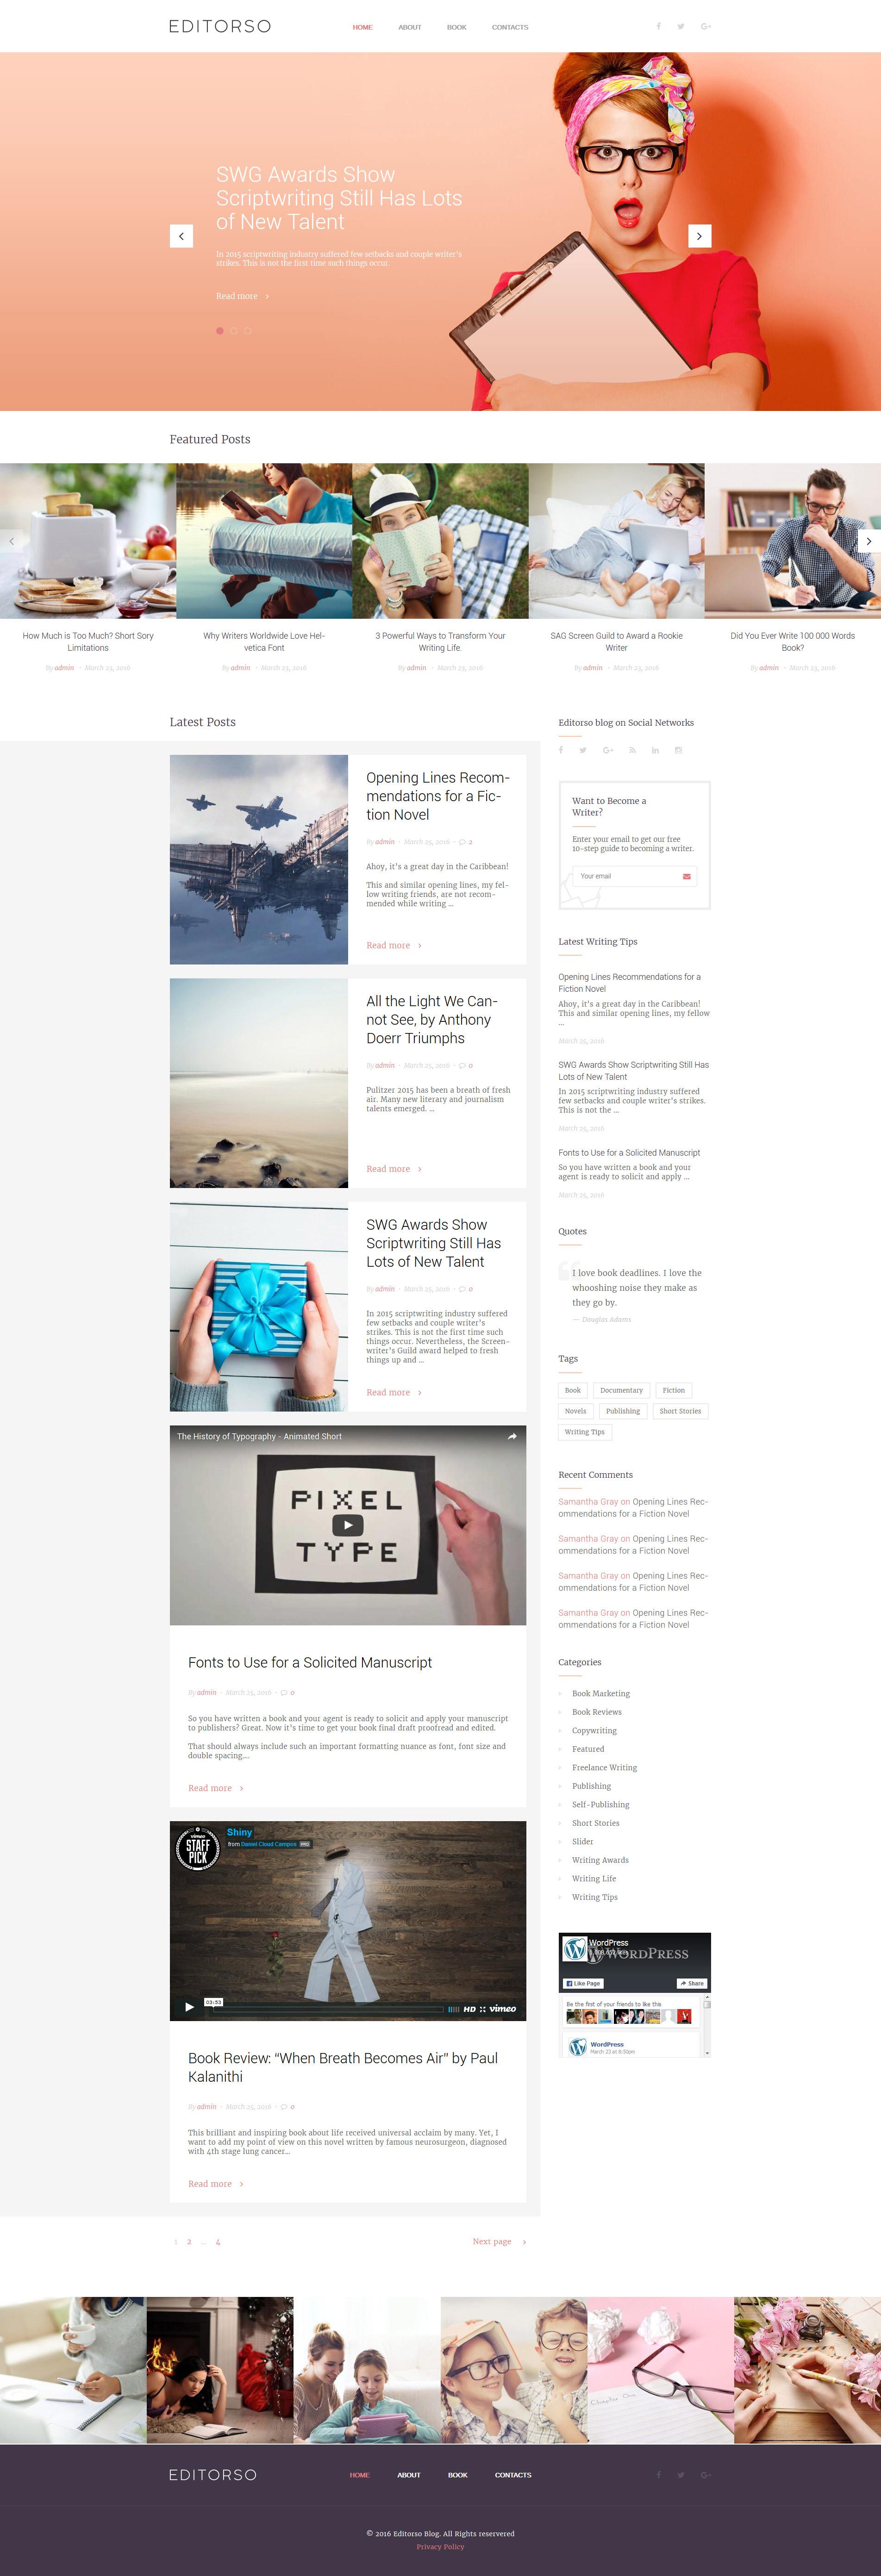 Editorso - Journalist Blog Tema WordPress №58513